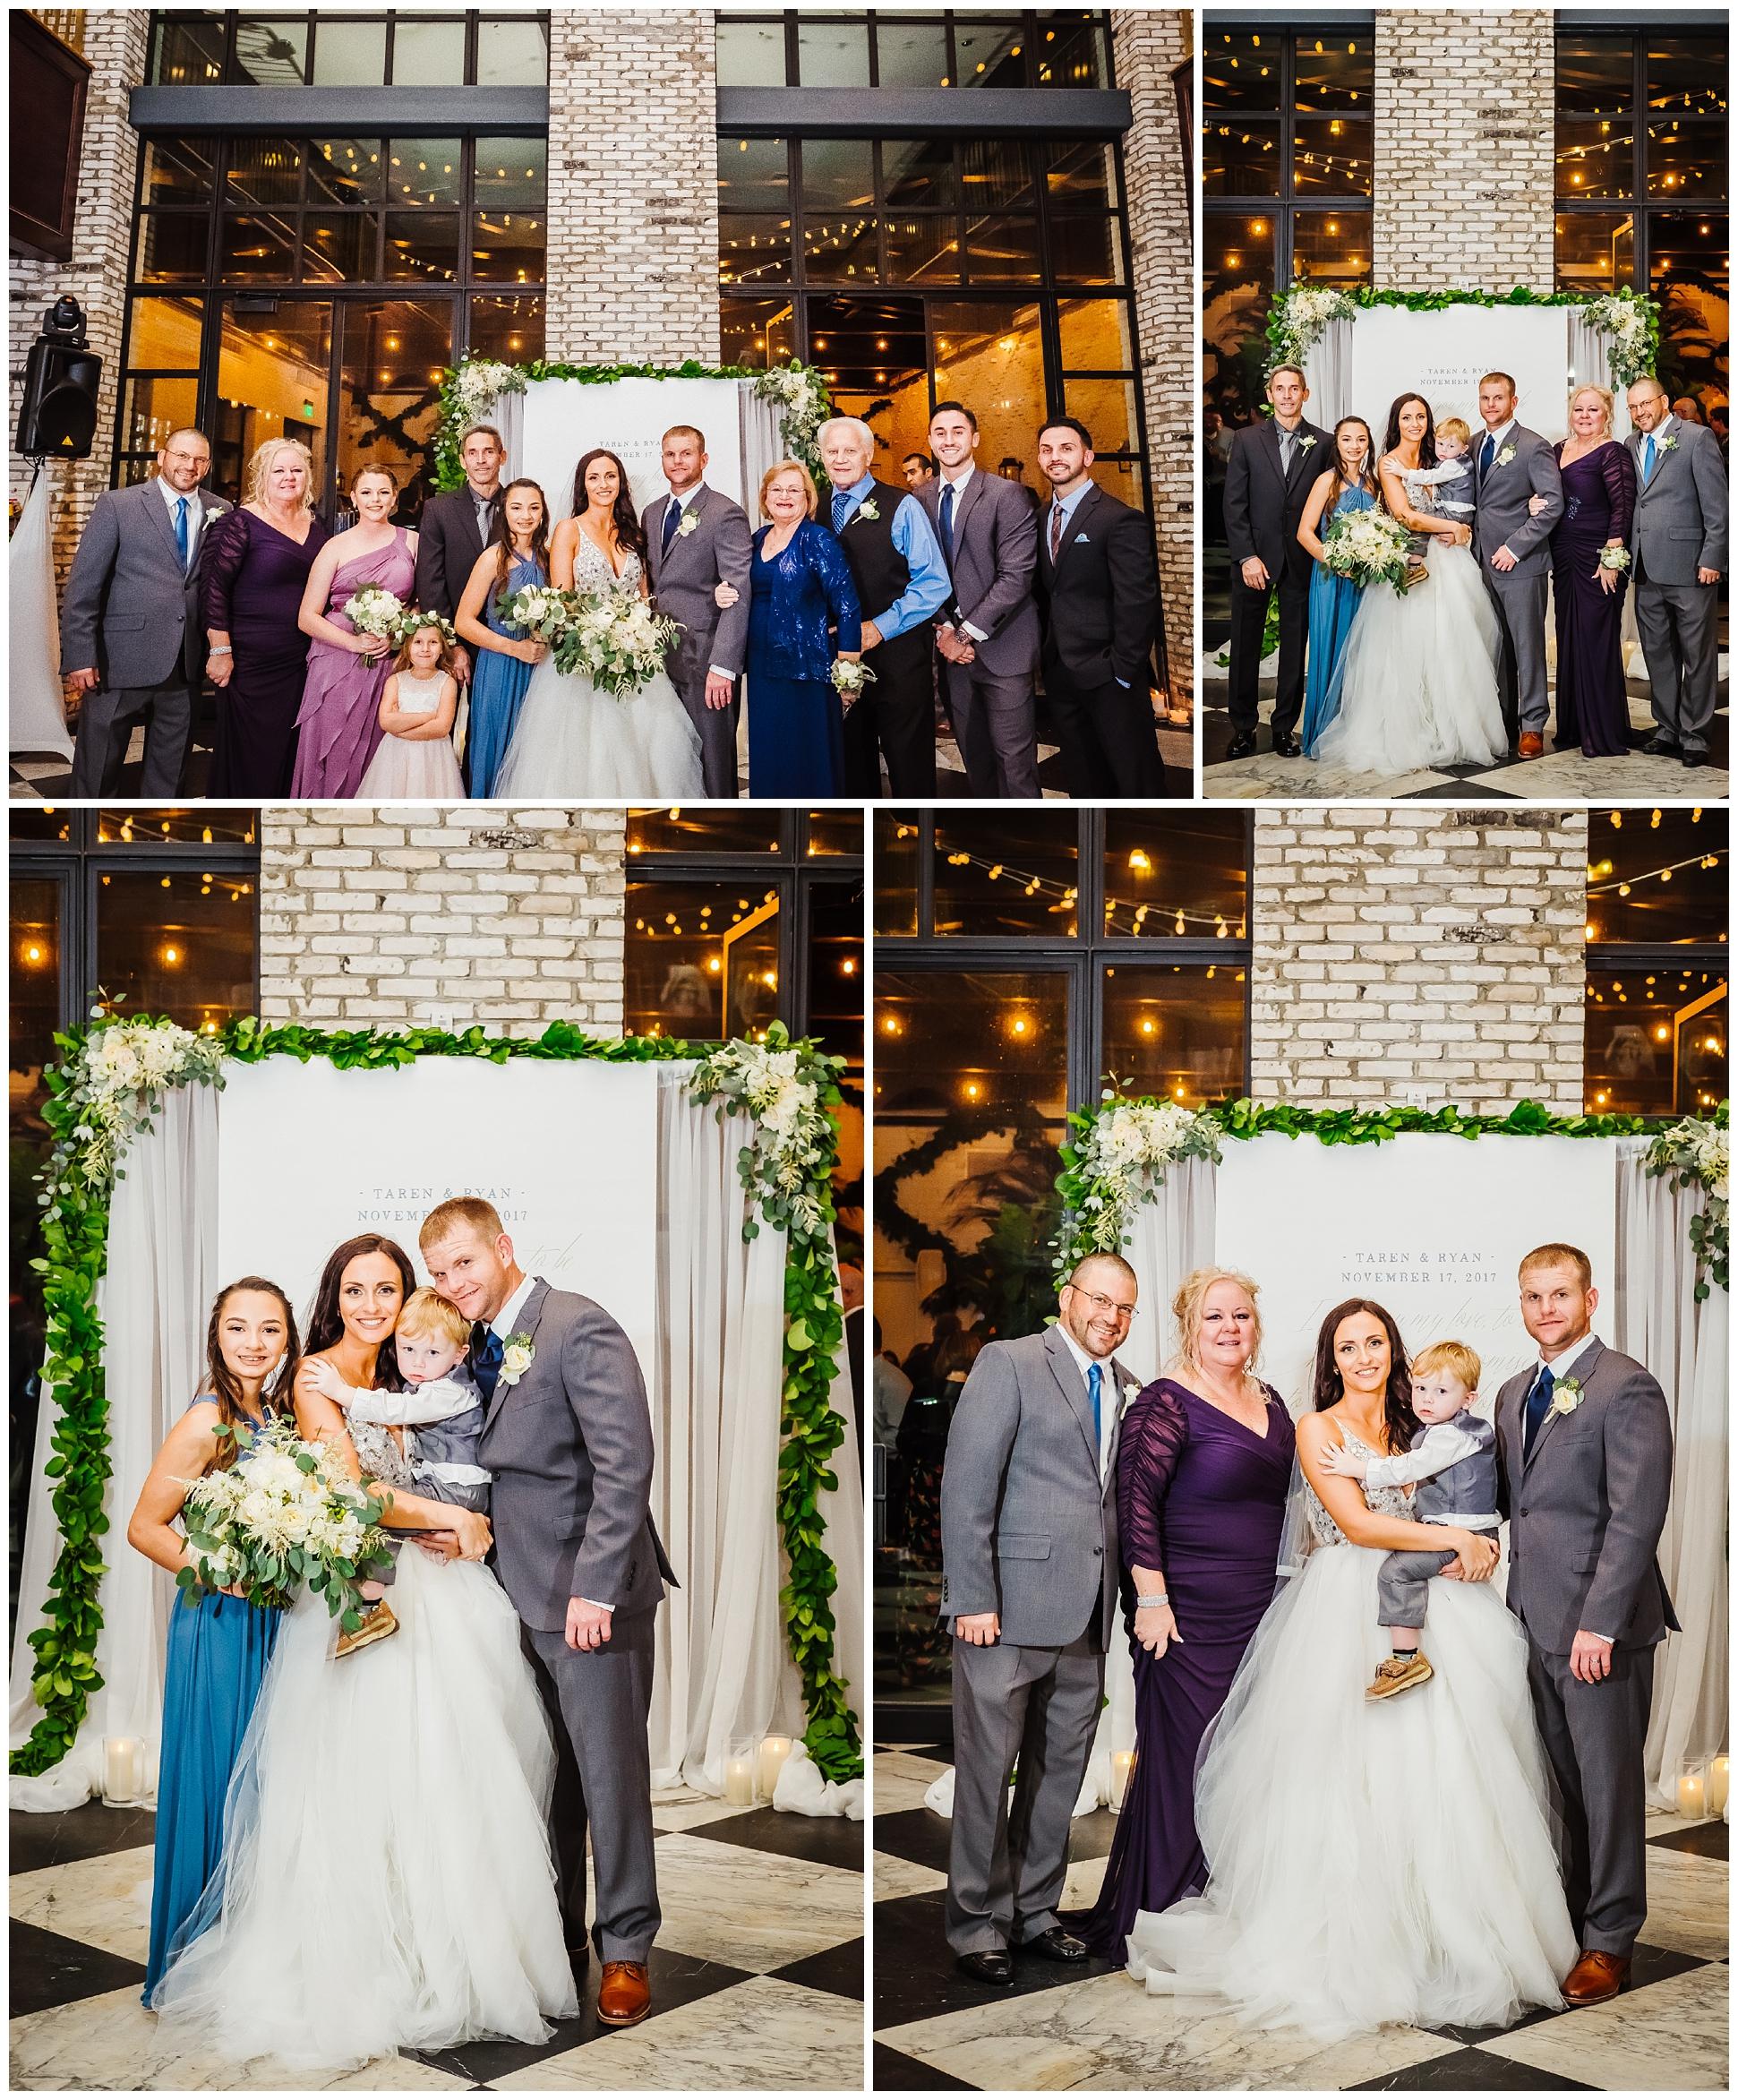 tampa-wedding-photographer-oxford-exchange-garland-candlelight-gold-hayley-paige_0048.jpg